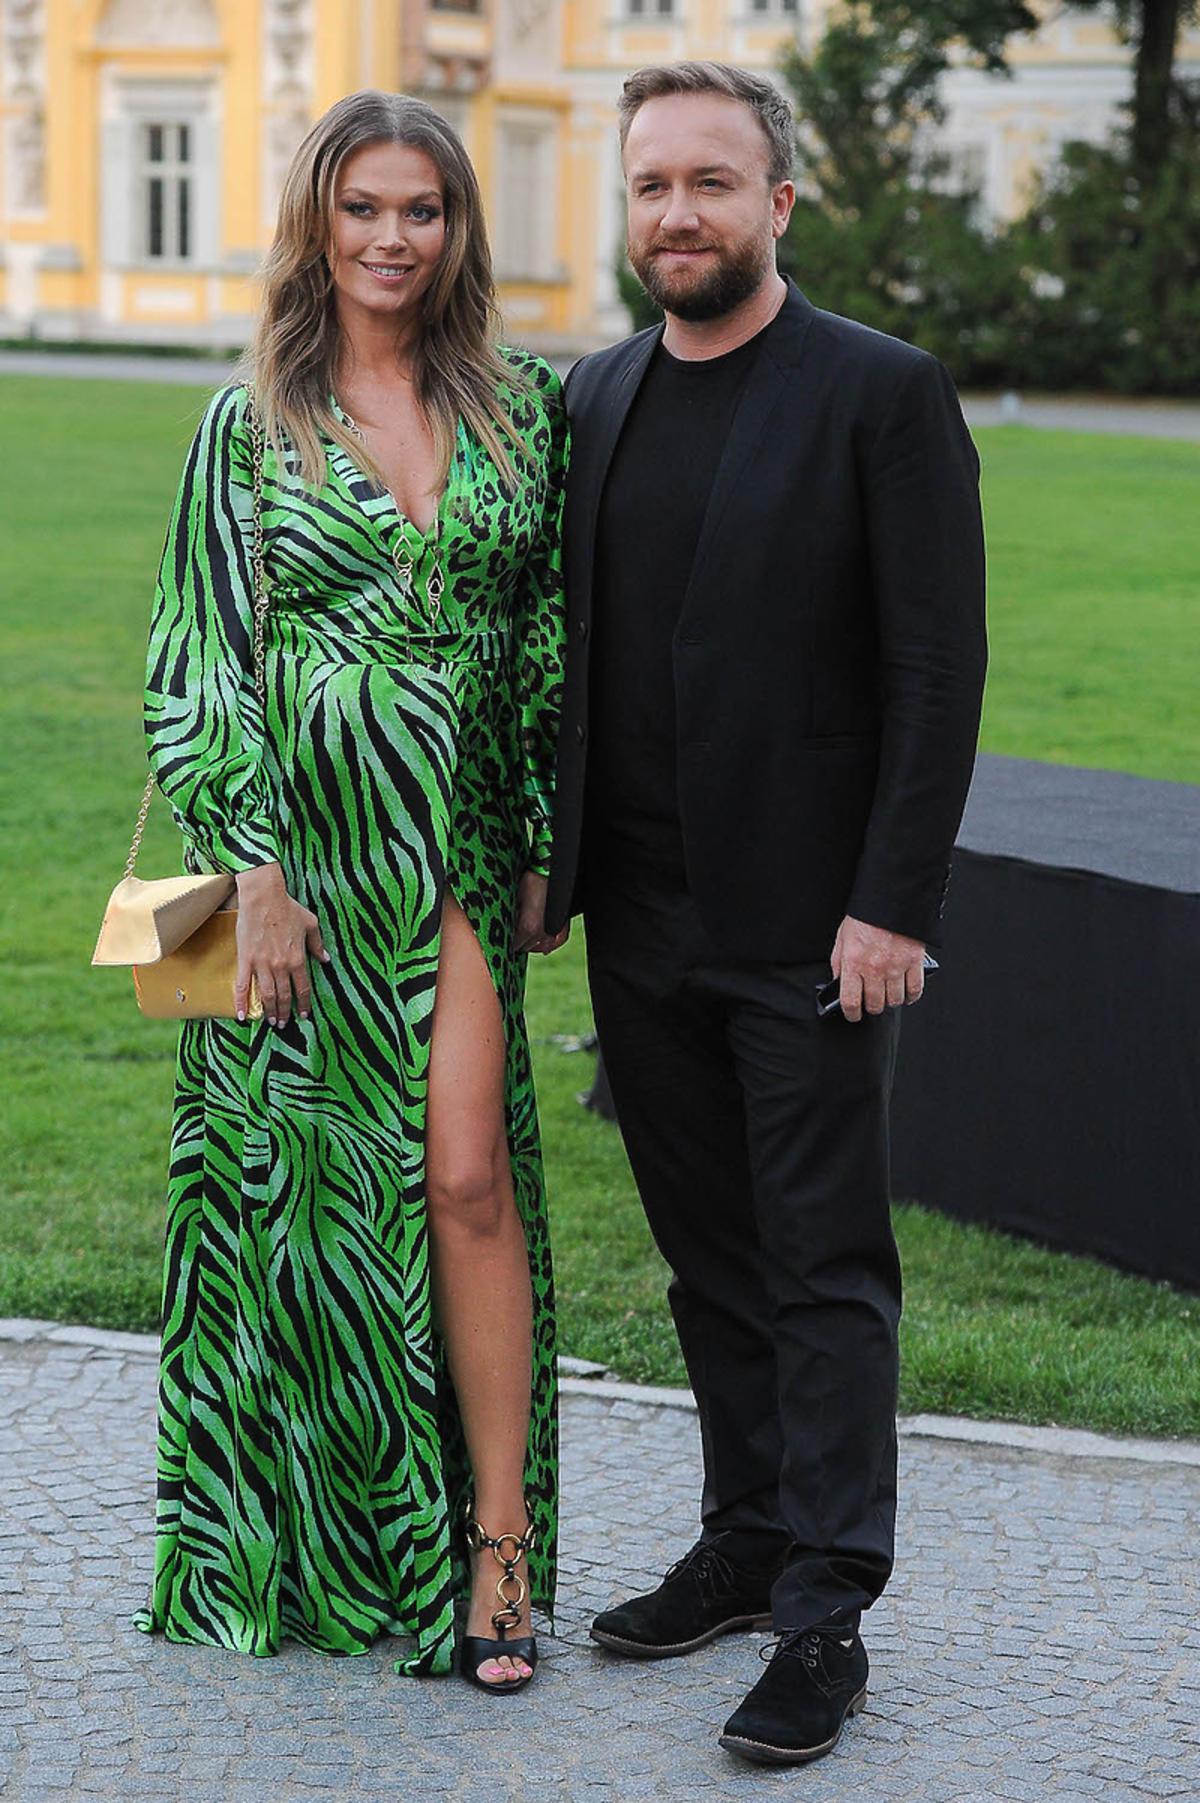 Tamara Arciuch i Bartek Kasprzykowski na imprezie Raffaello